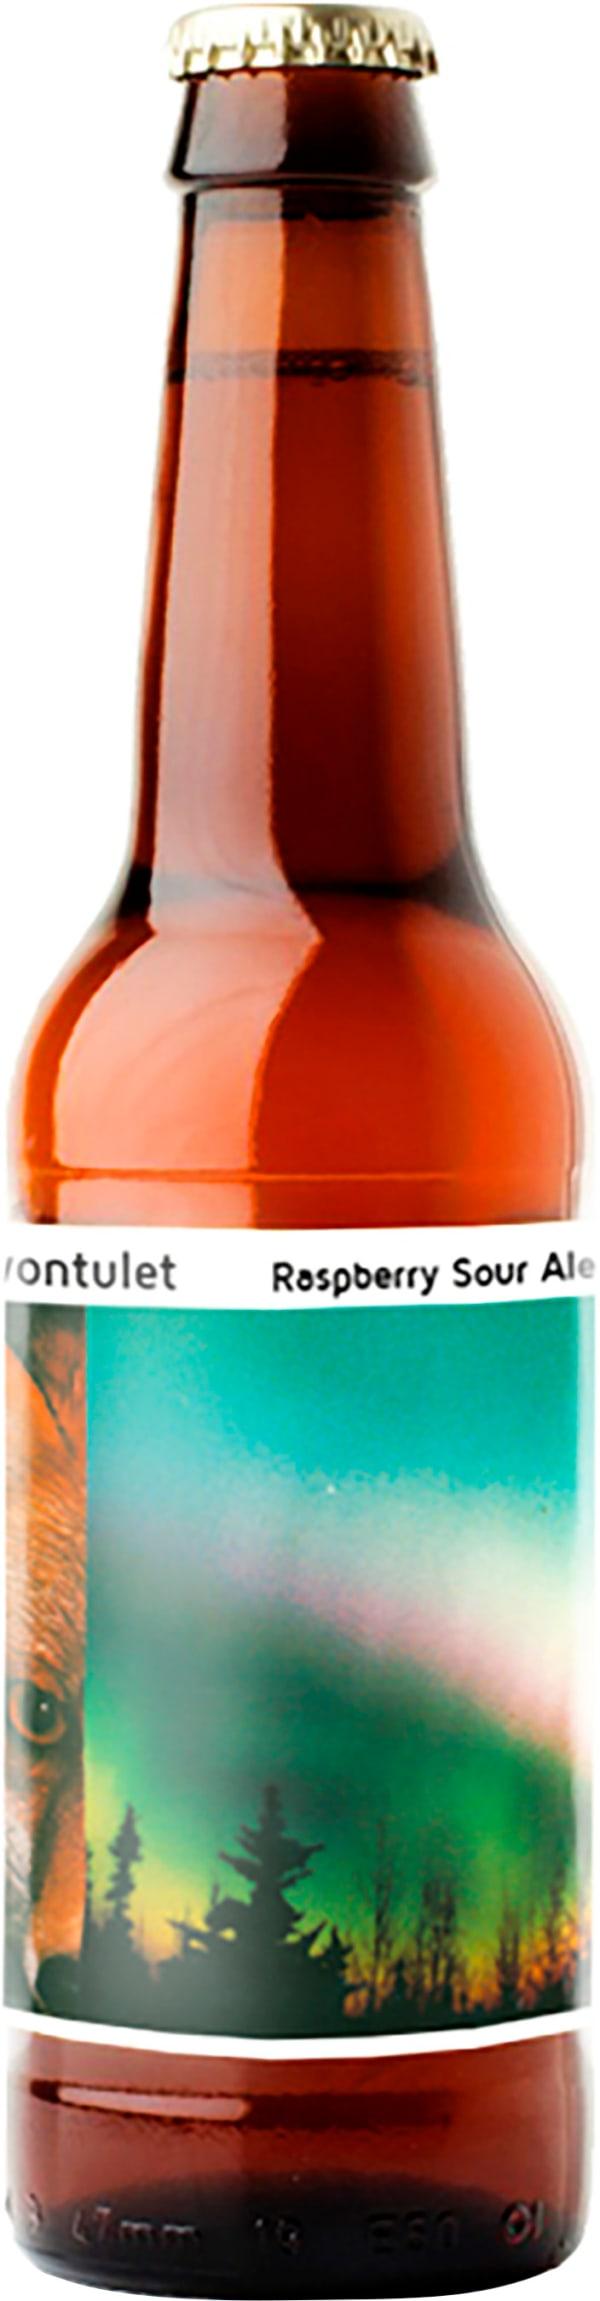 Nomada Revontulet Raspberry Sour Ale